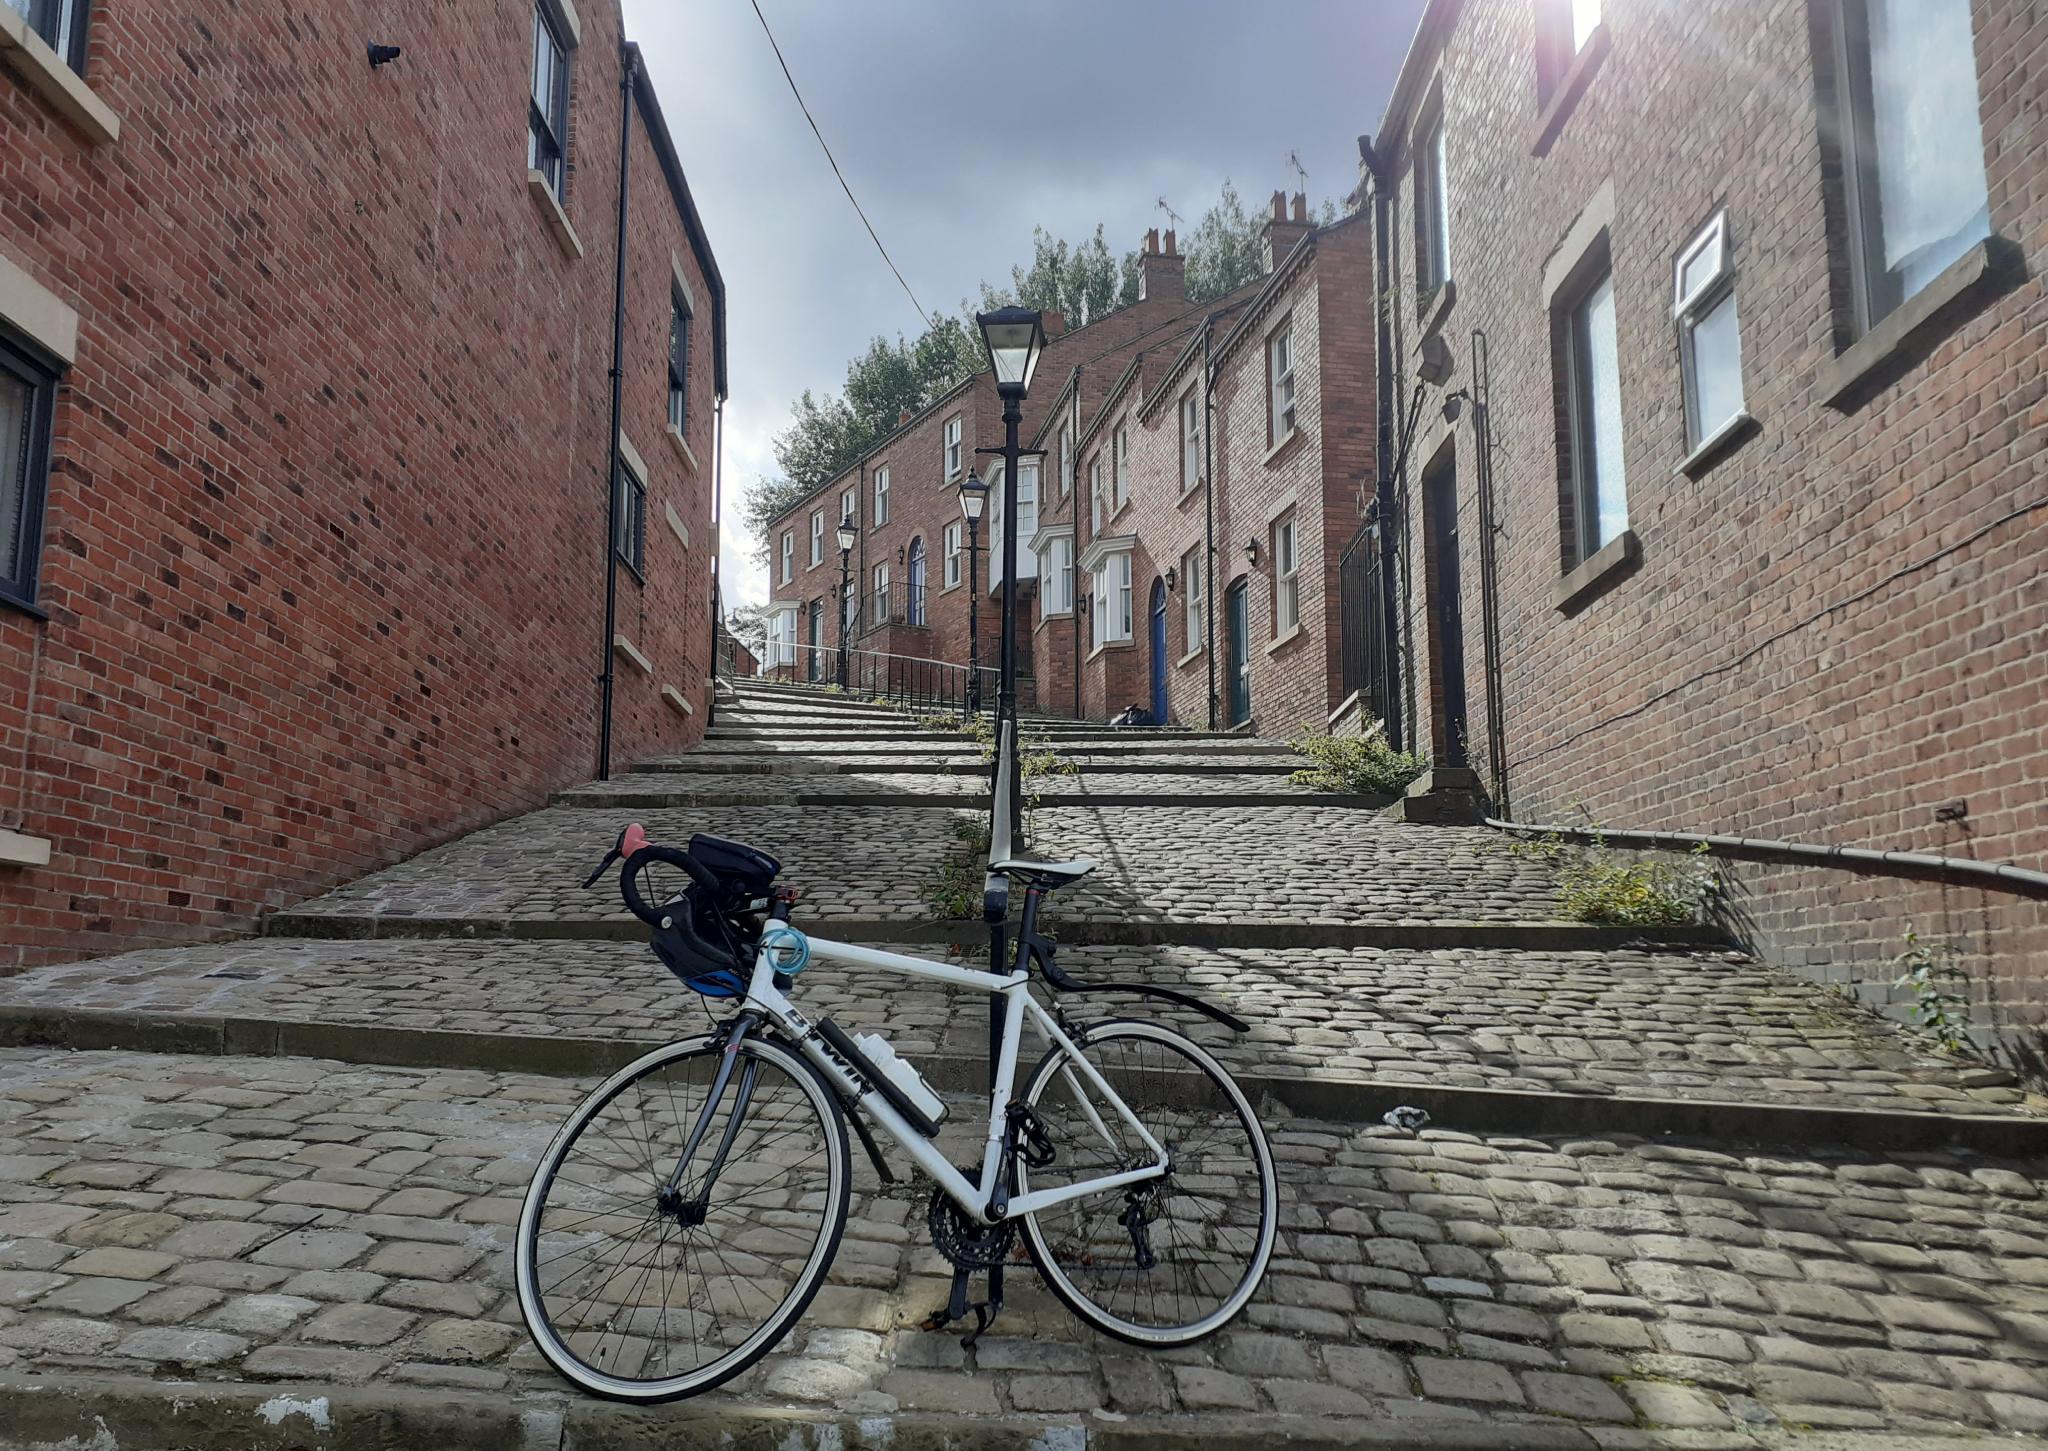 On my bike-20200719_203240-jpg